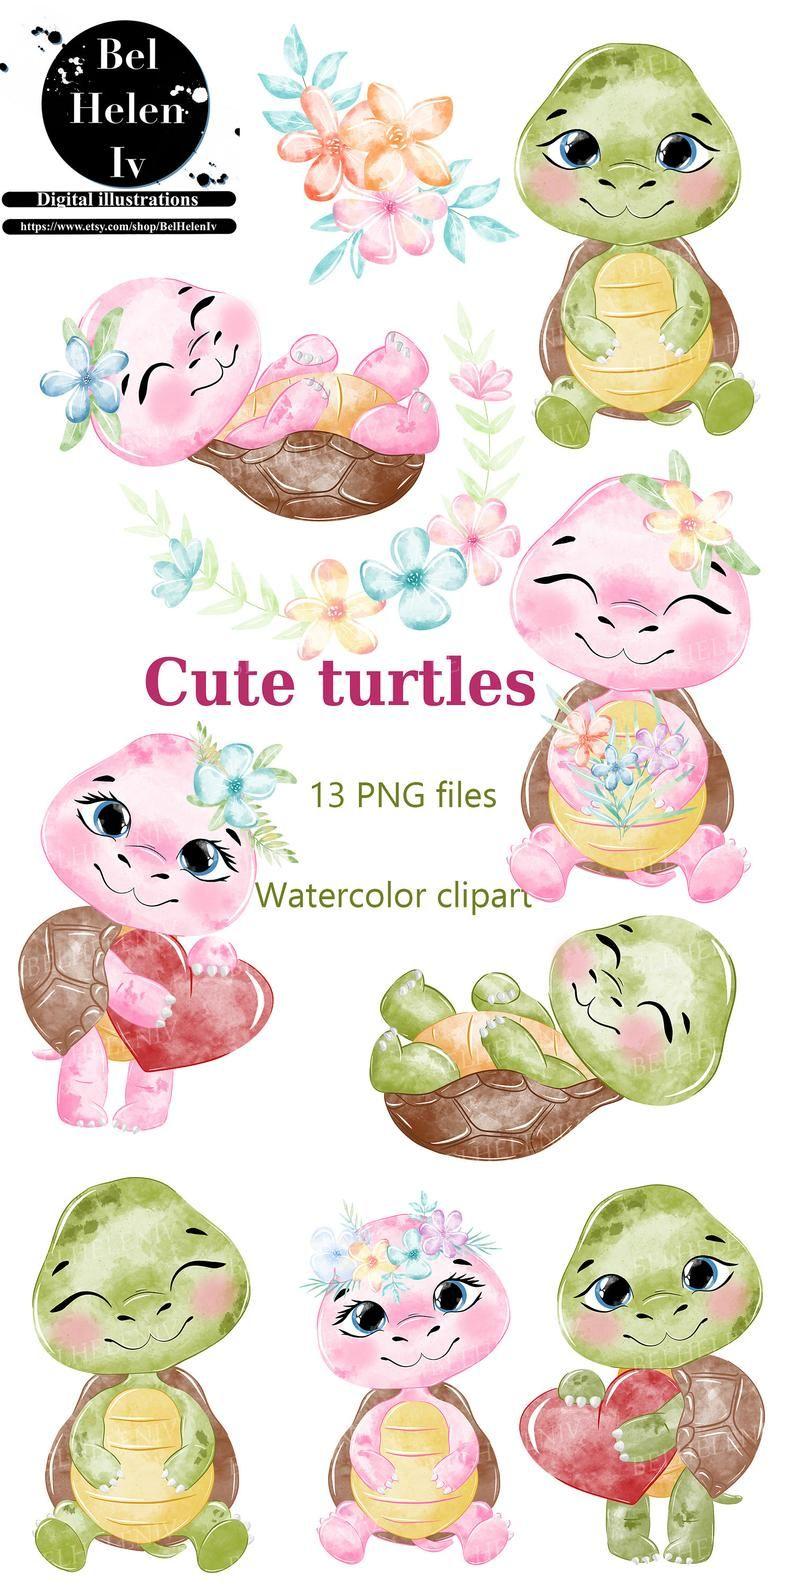 Cute Turtles Clip Art Watercolor Turtles Clipart Family Etsy In 2021 Turtle Clip Art Cute Turtles Clip Art